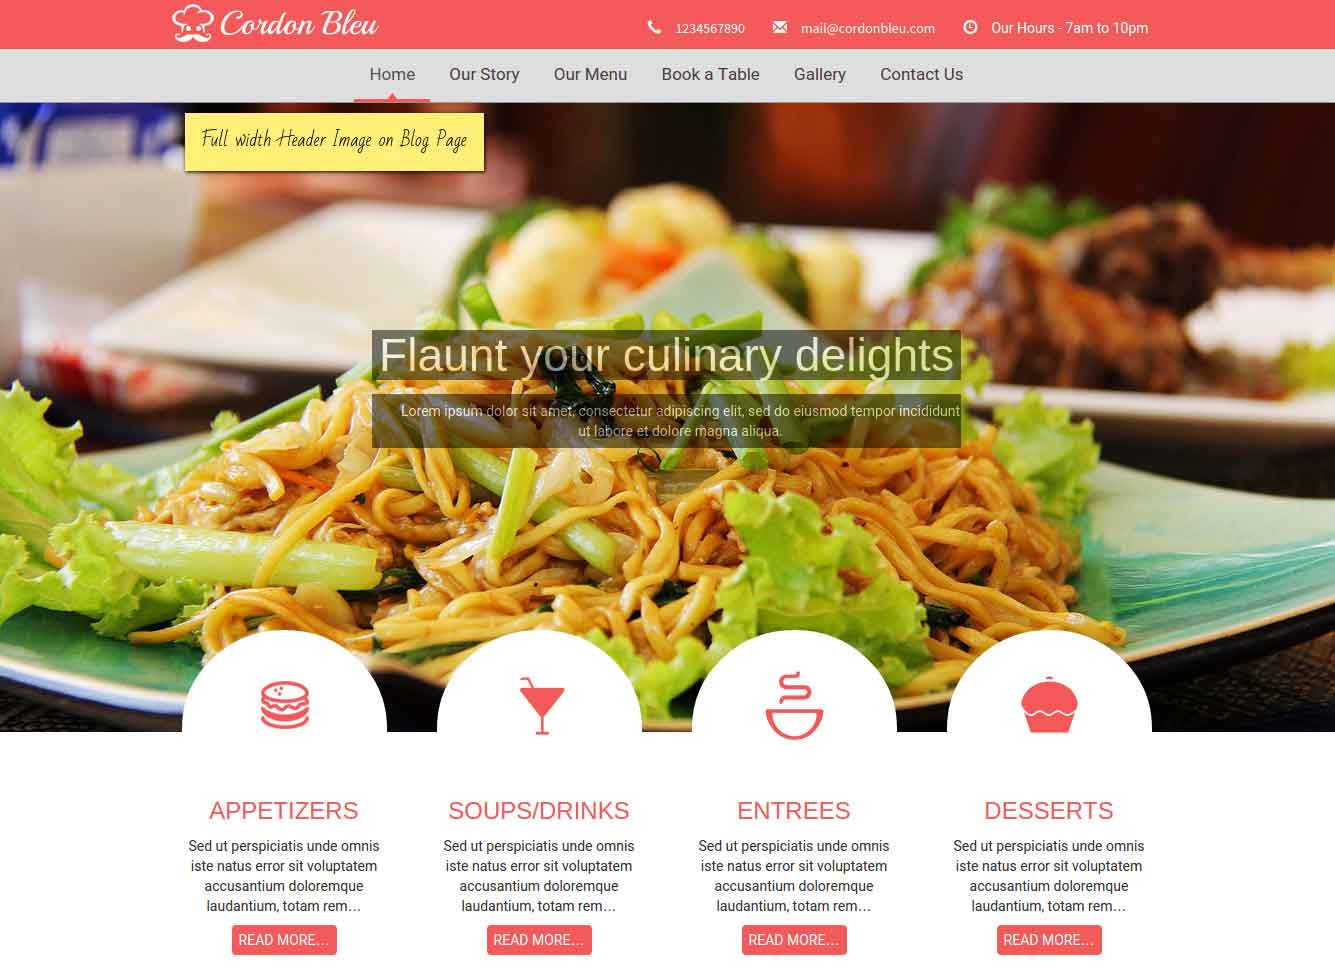 Cordon Bleu - WordPress Restaurant theme - fullwidth image